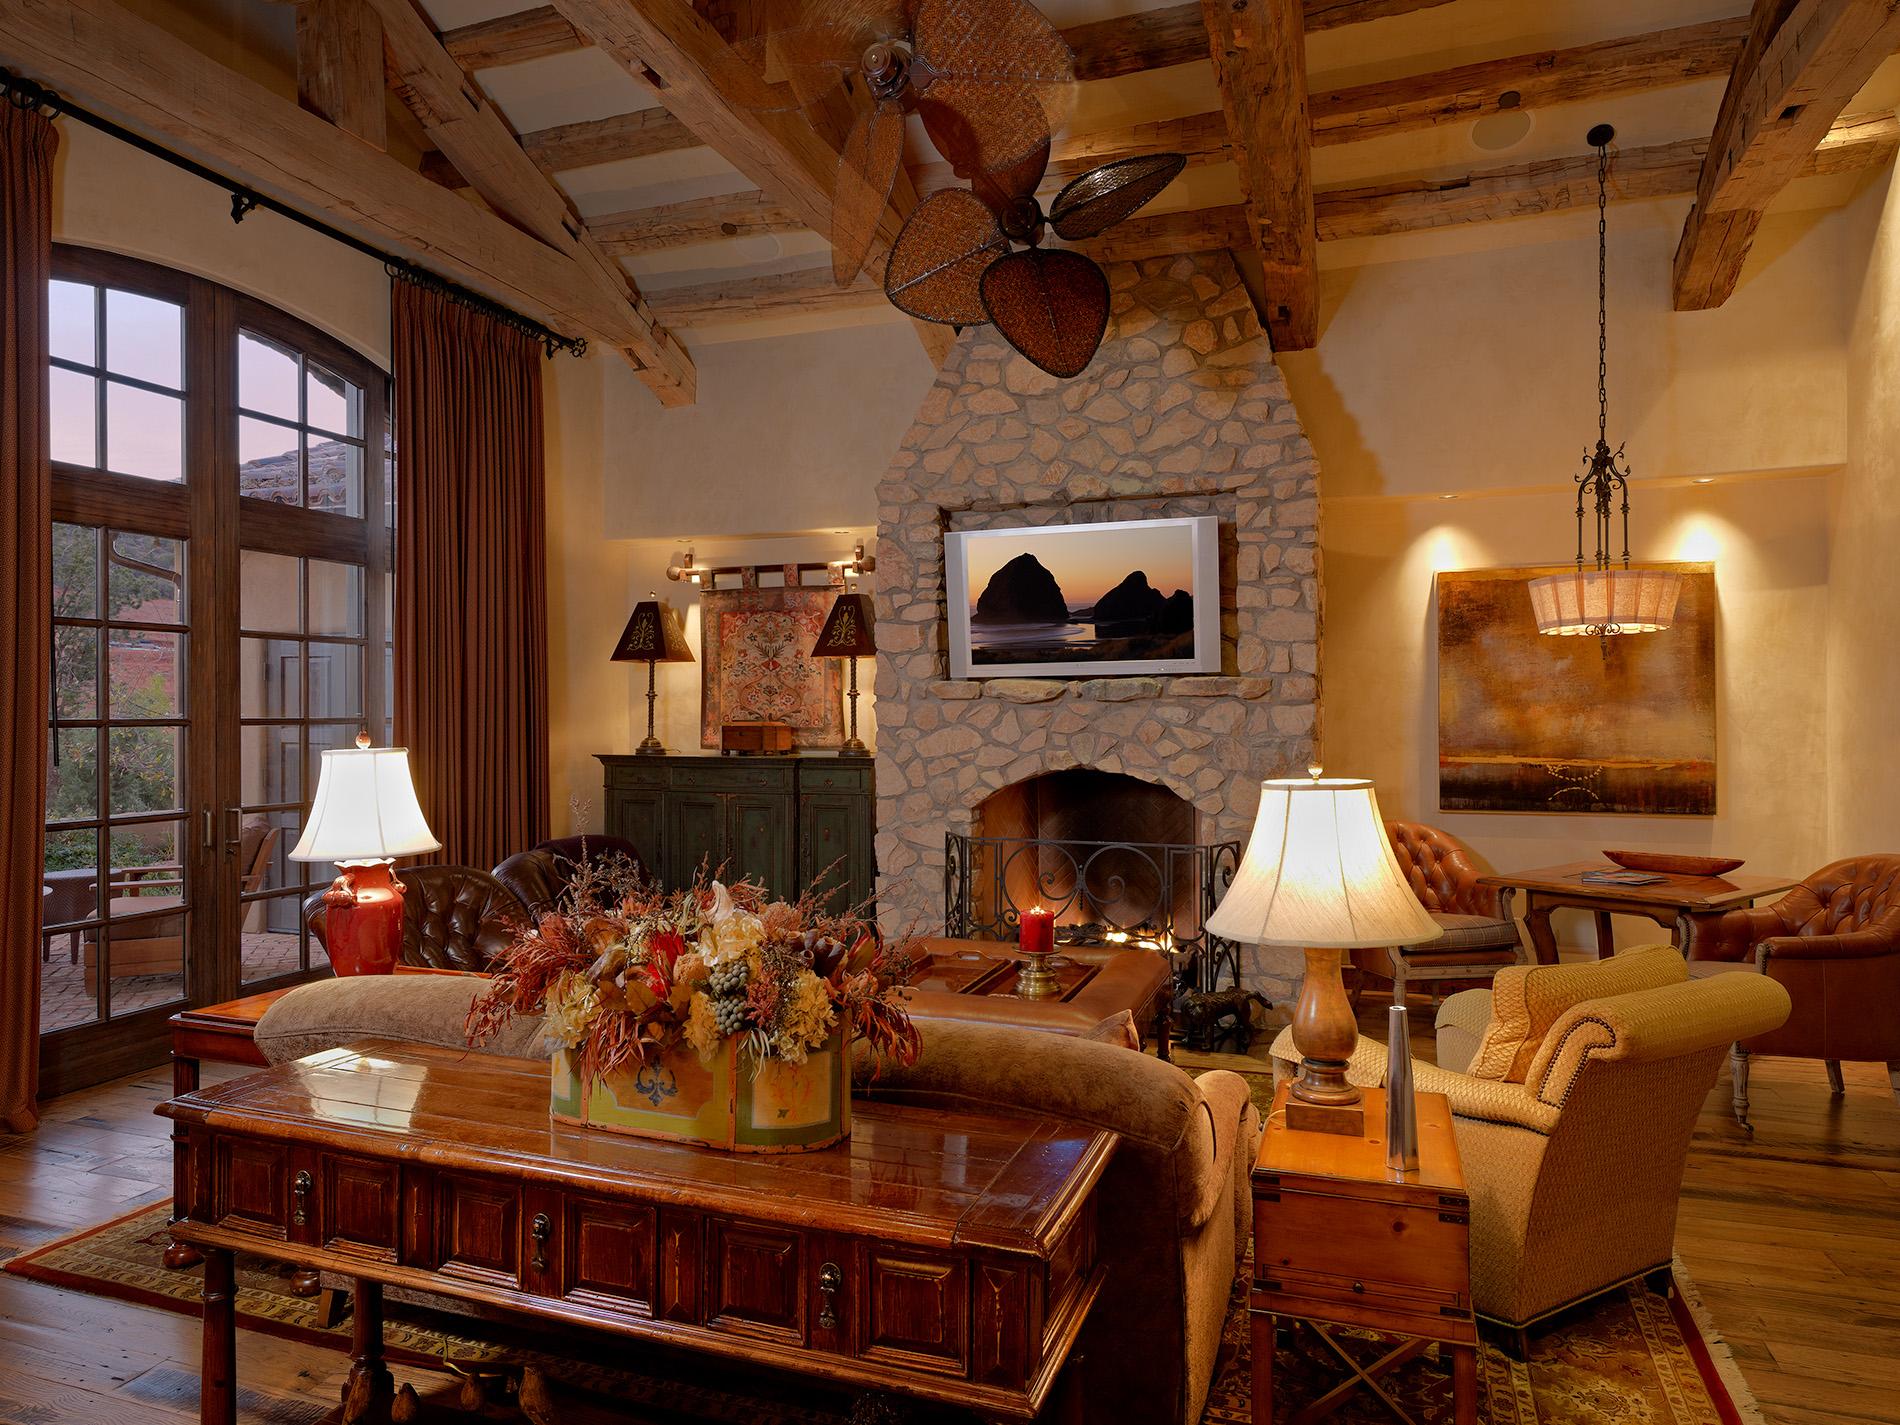 Seven Canyon Villa's by Guy Mancuso in Guy Mancuso